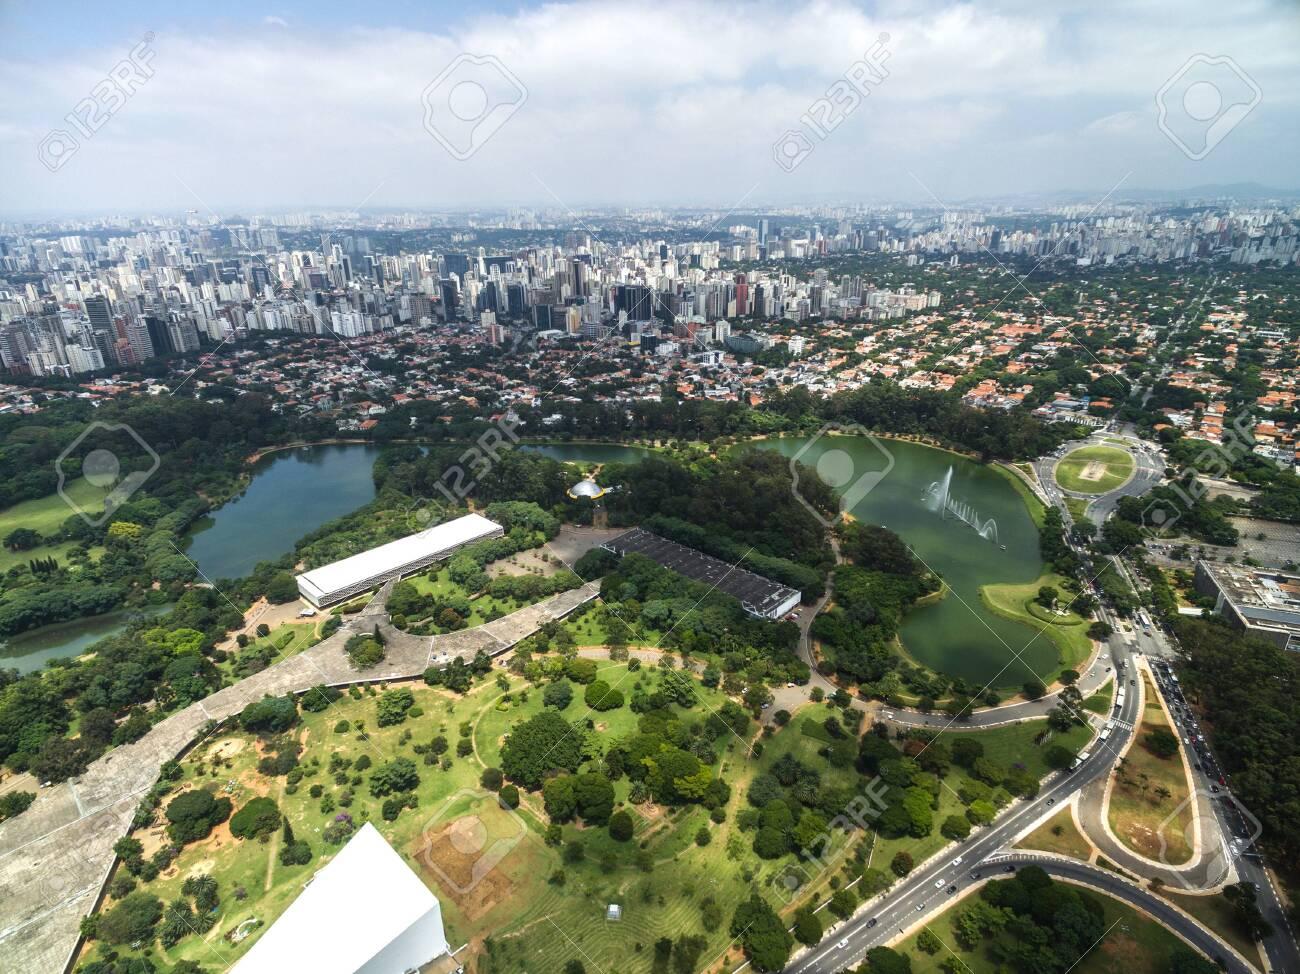 Aerial view of Ibirapuera in Sao Paulo, Brazil - 129562939